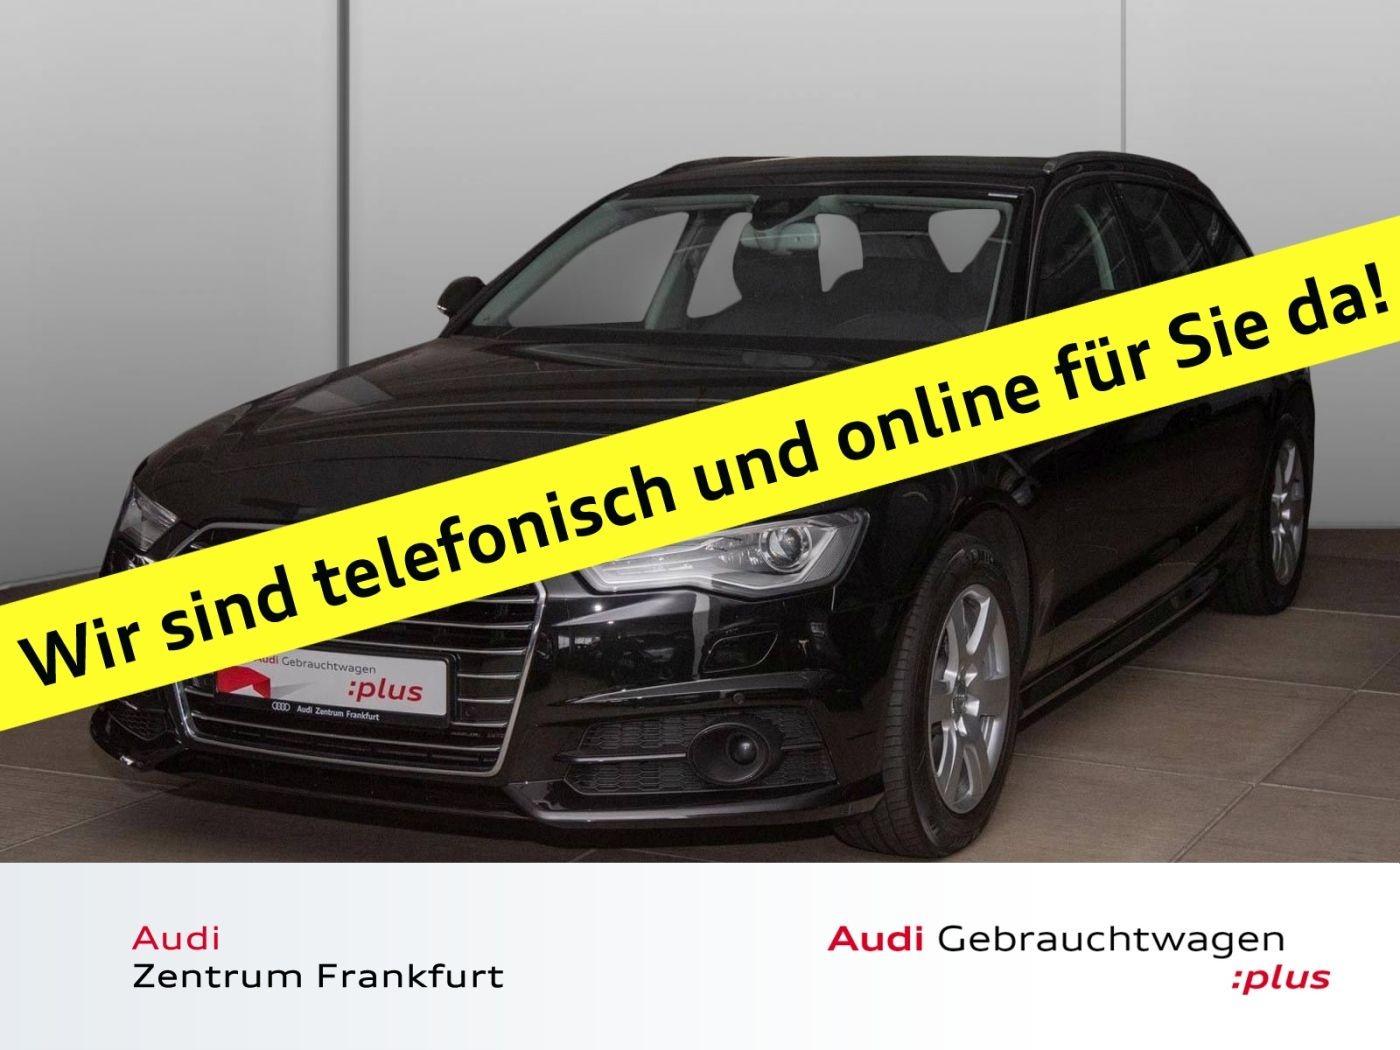 Audi A6 Avant 3.0 TDI quattro S tronic Navi Xenon Alcantara Sportsitze, Jahr 2017, Diesel